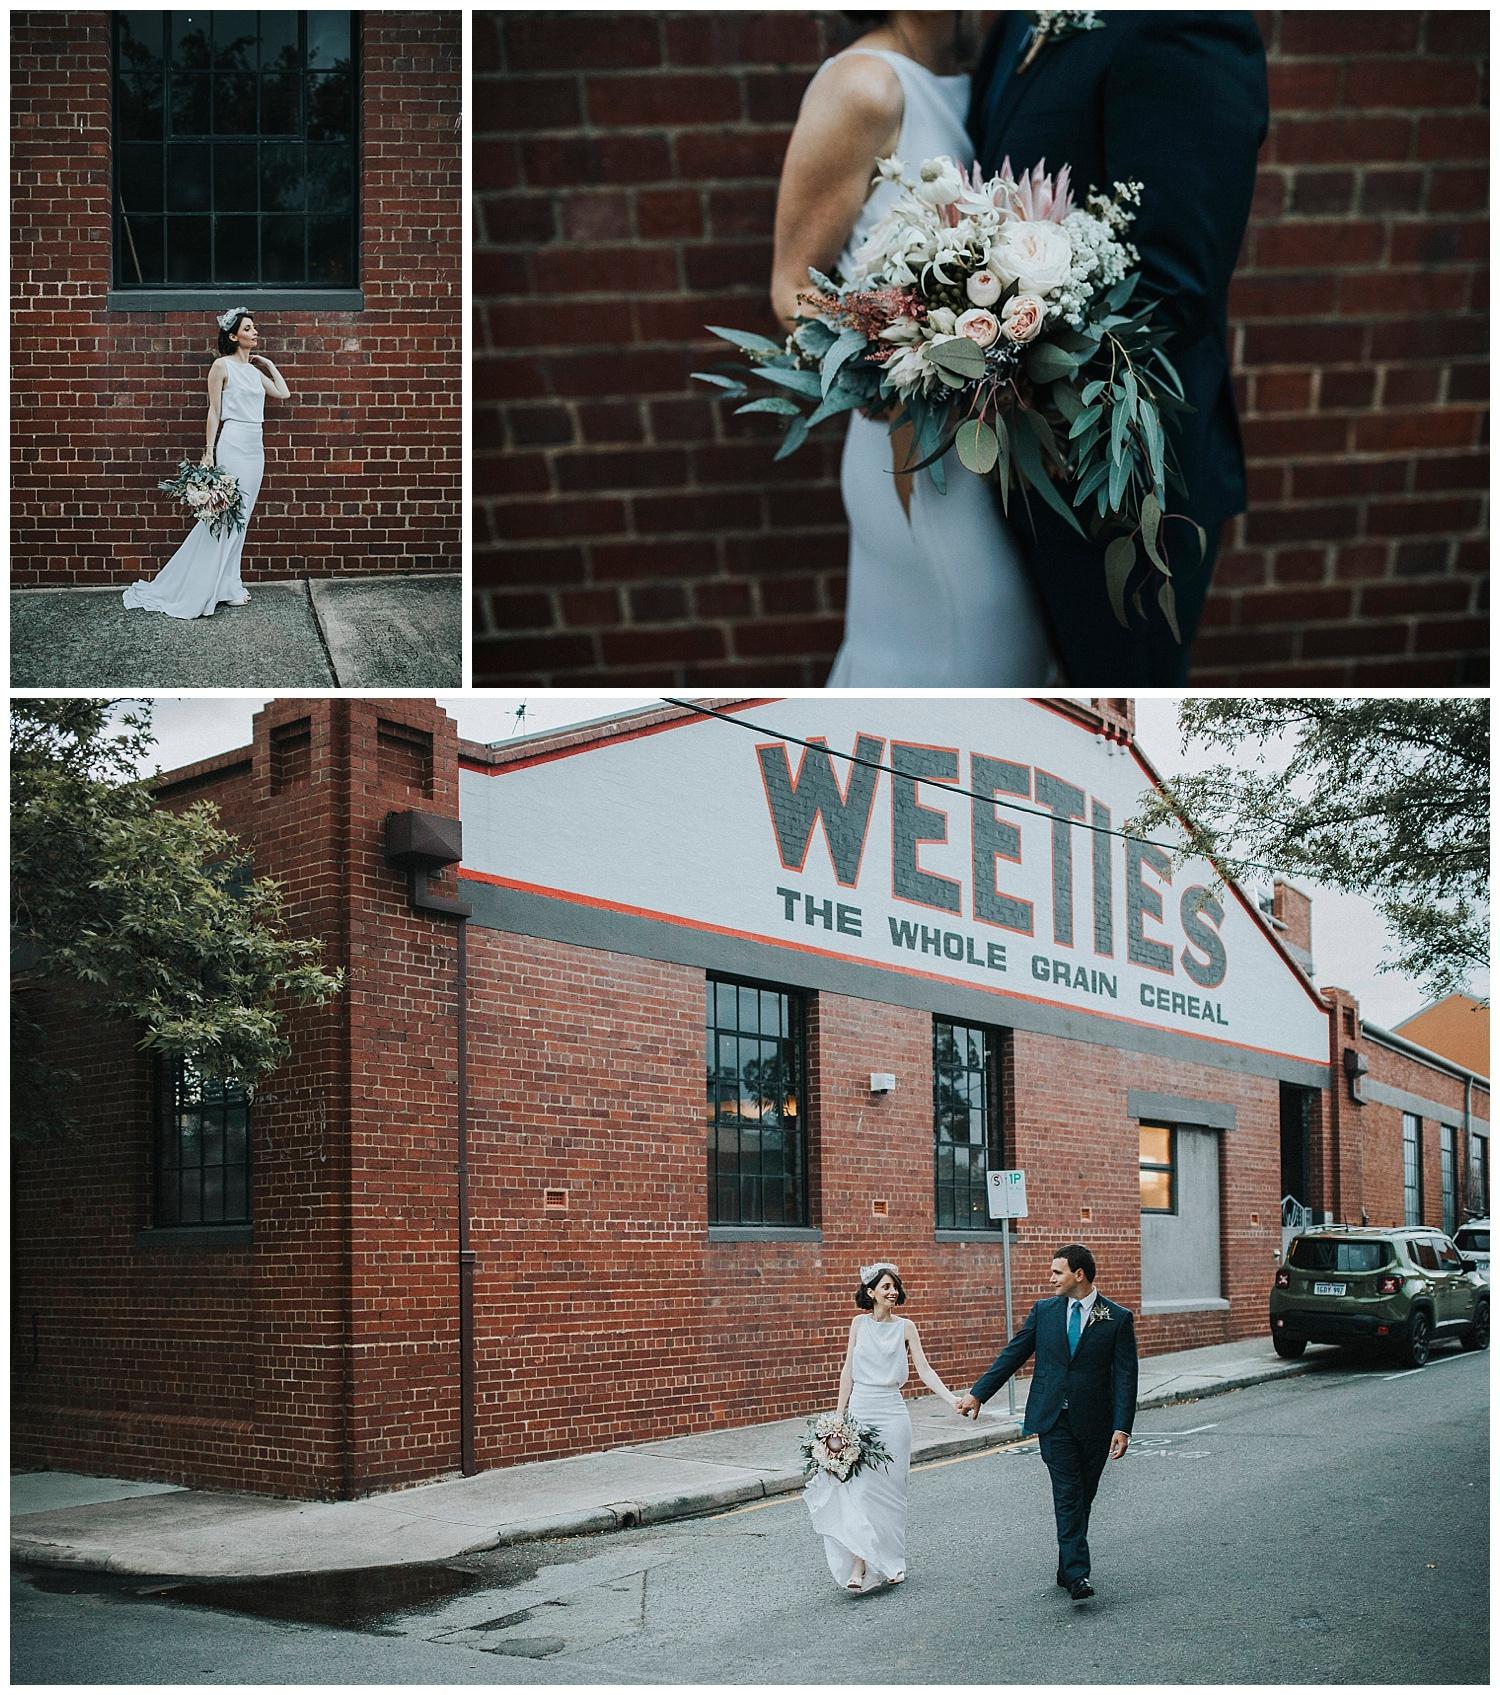 guildhall_wedding_keeper_creative_23.JPG